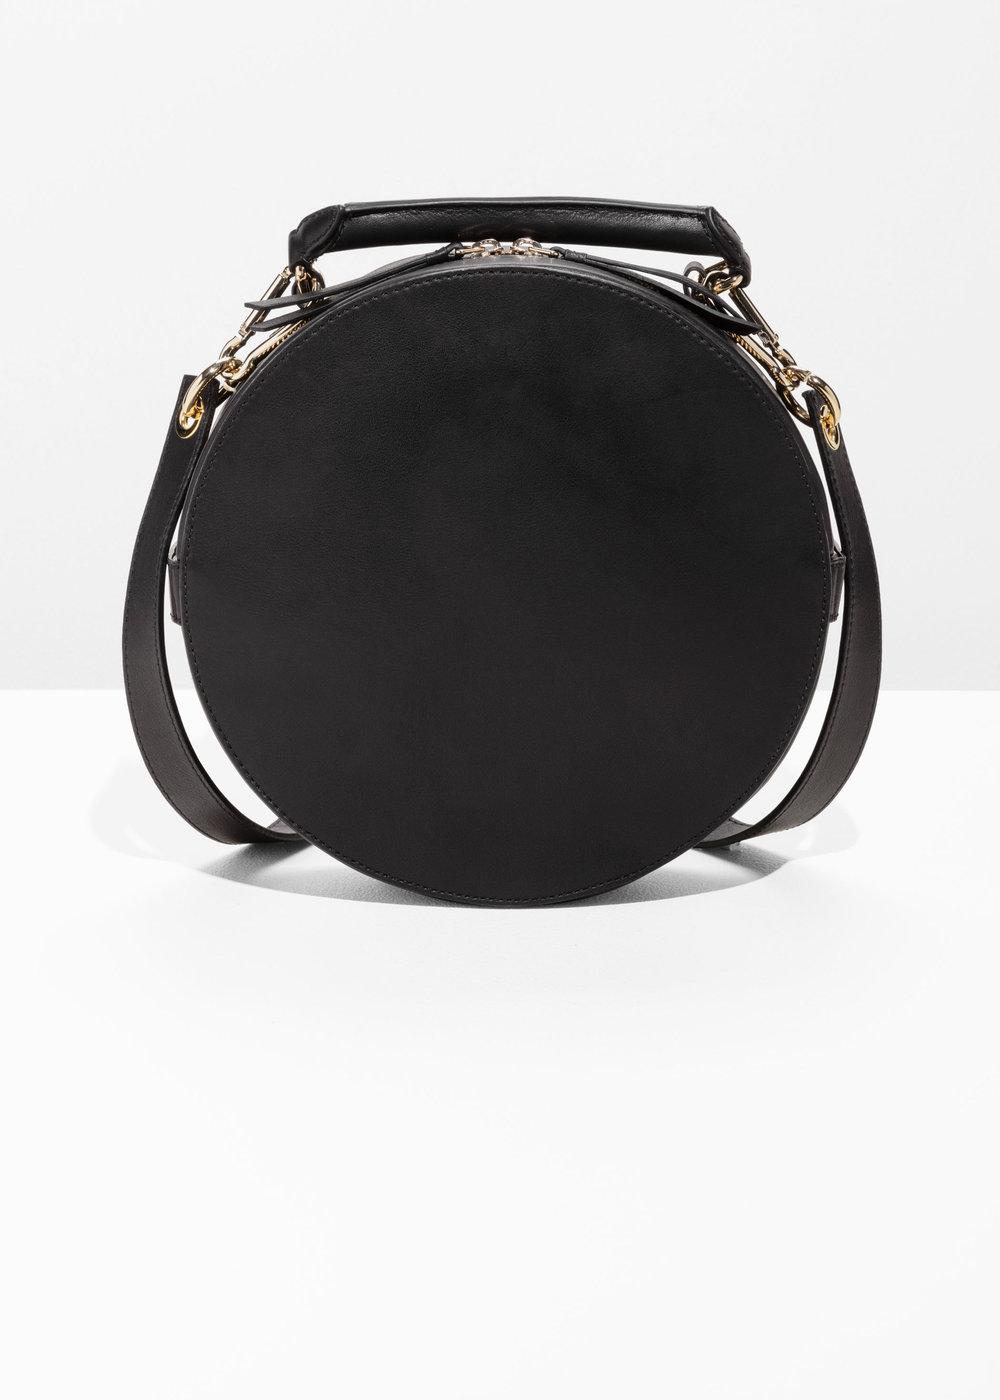 Circle Bag $145